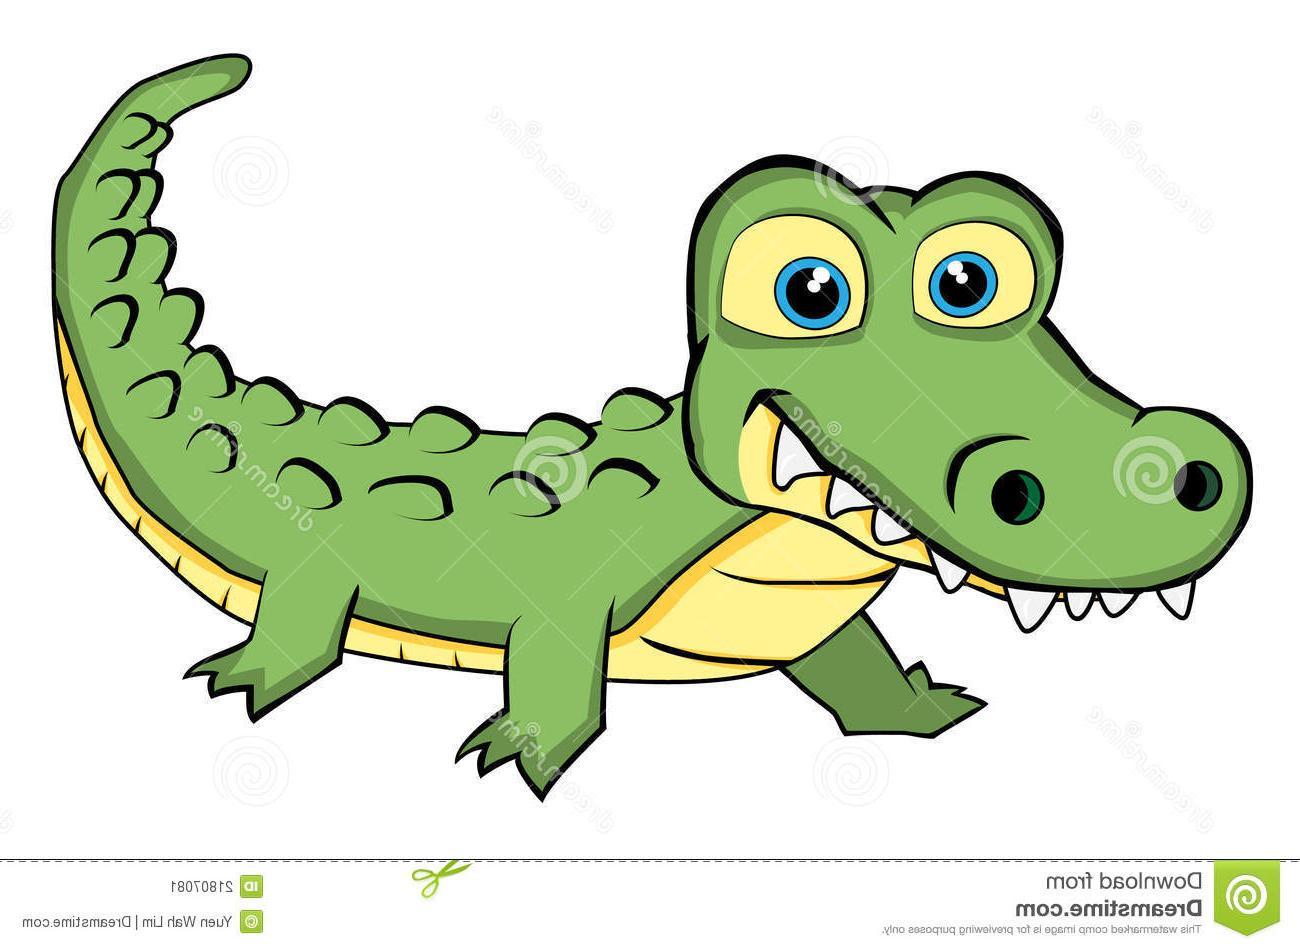 Crocodile clipart. Station